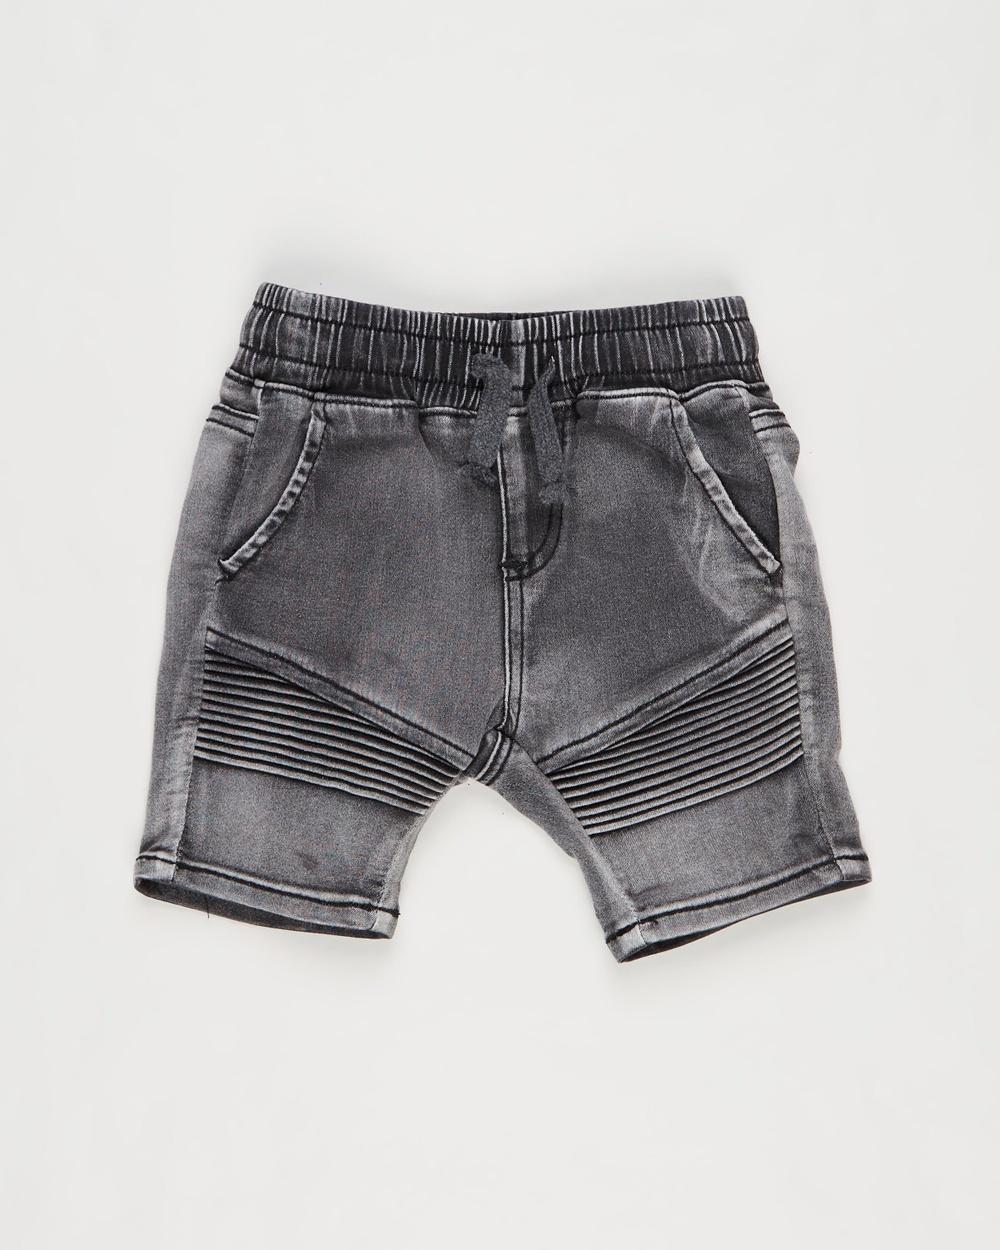 Cotton On Baby Jay Moto Shorts Babies Denim Black Wash Australia